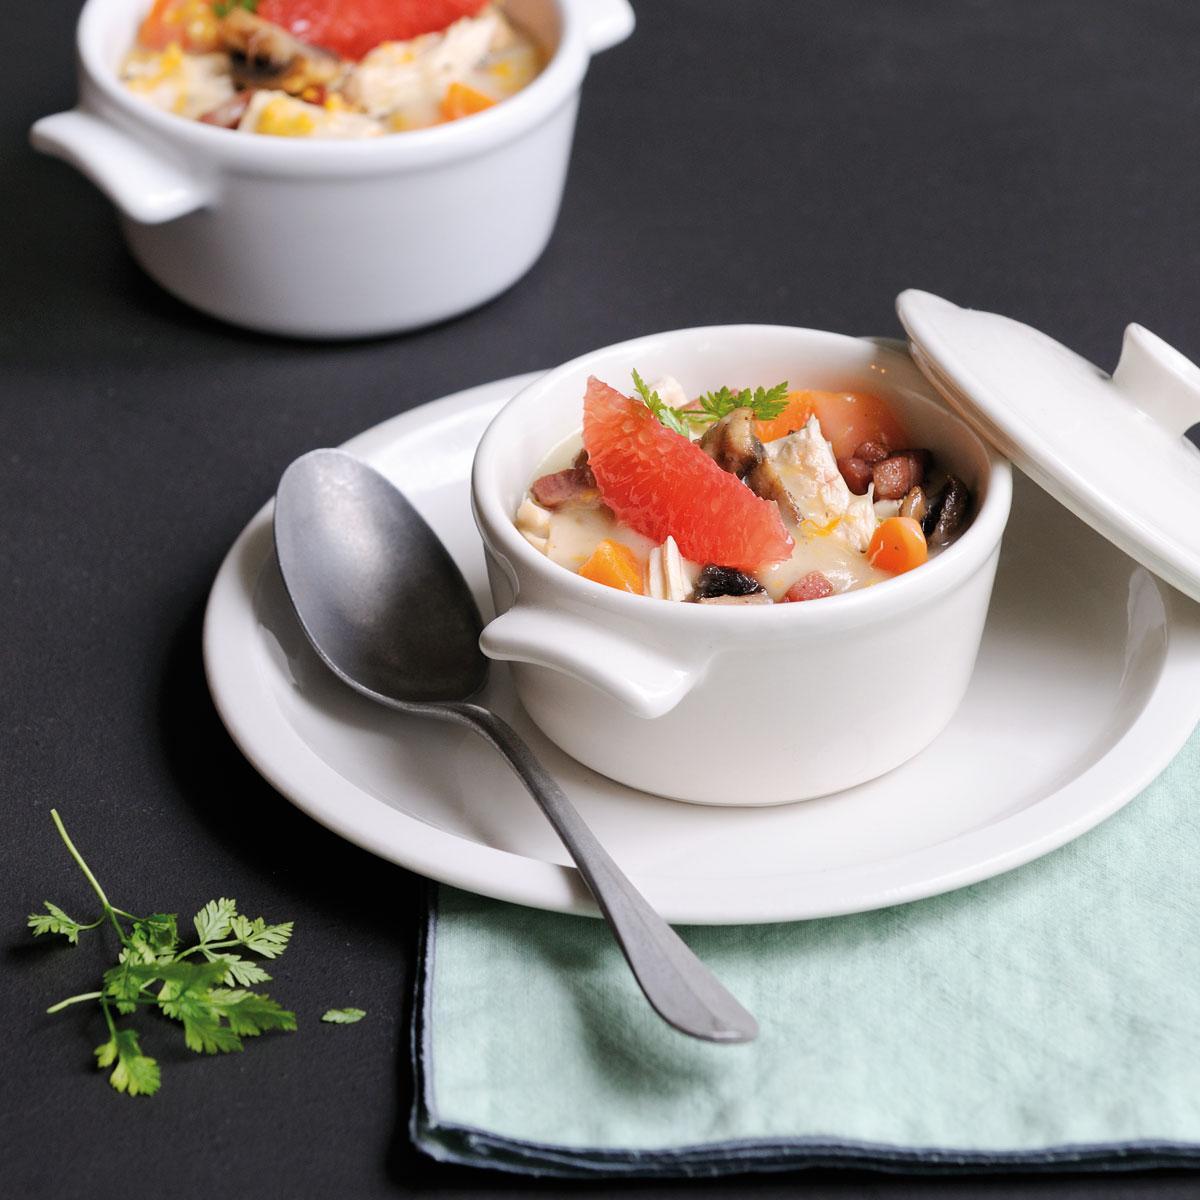 recette blanquette de volaille au pamplemousse cuisine madame figaro. Black Bedroom Furniture Sets. Home Design Ideas